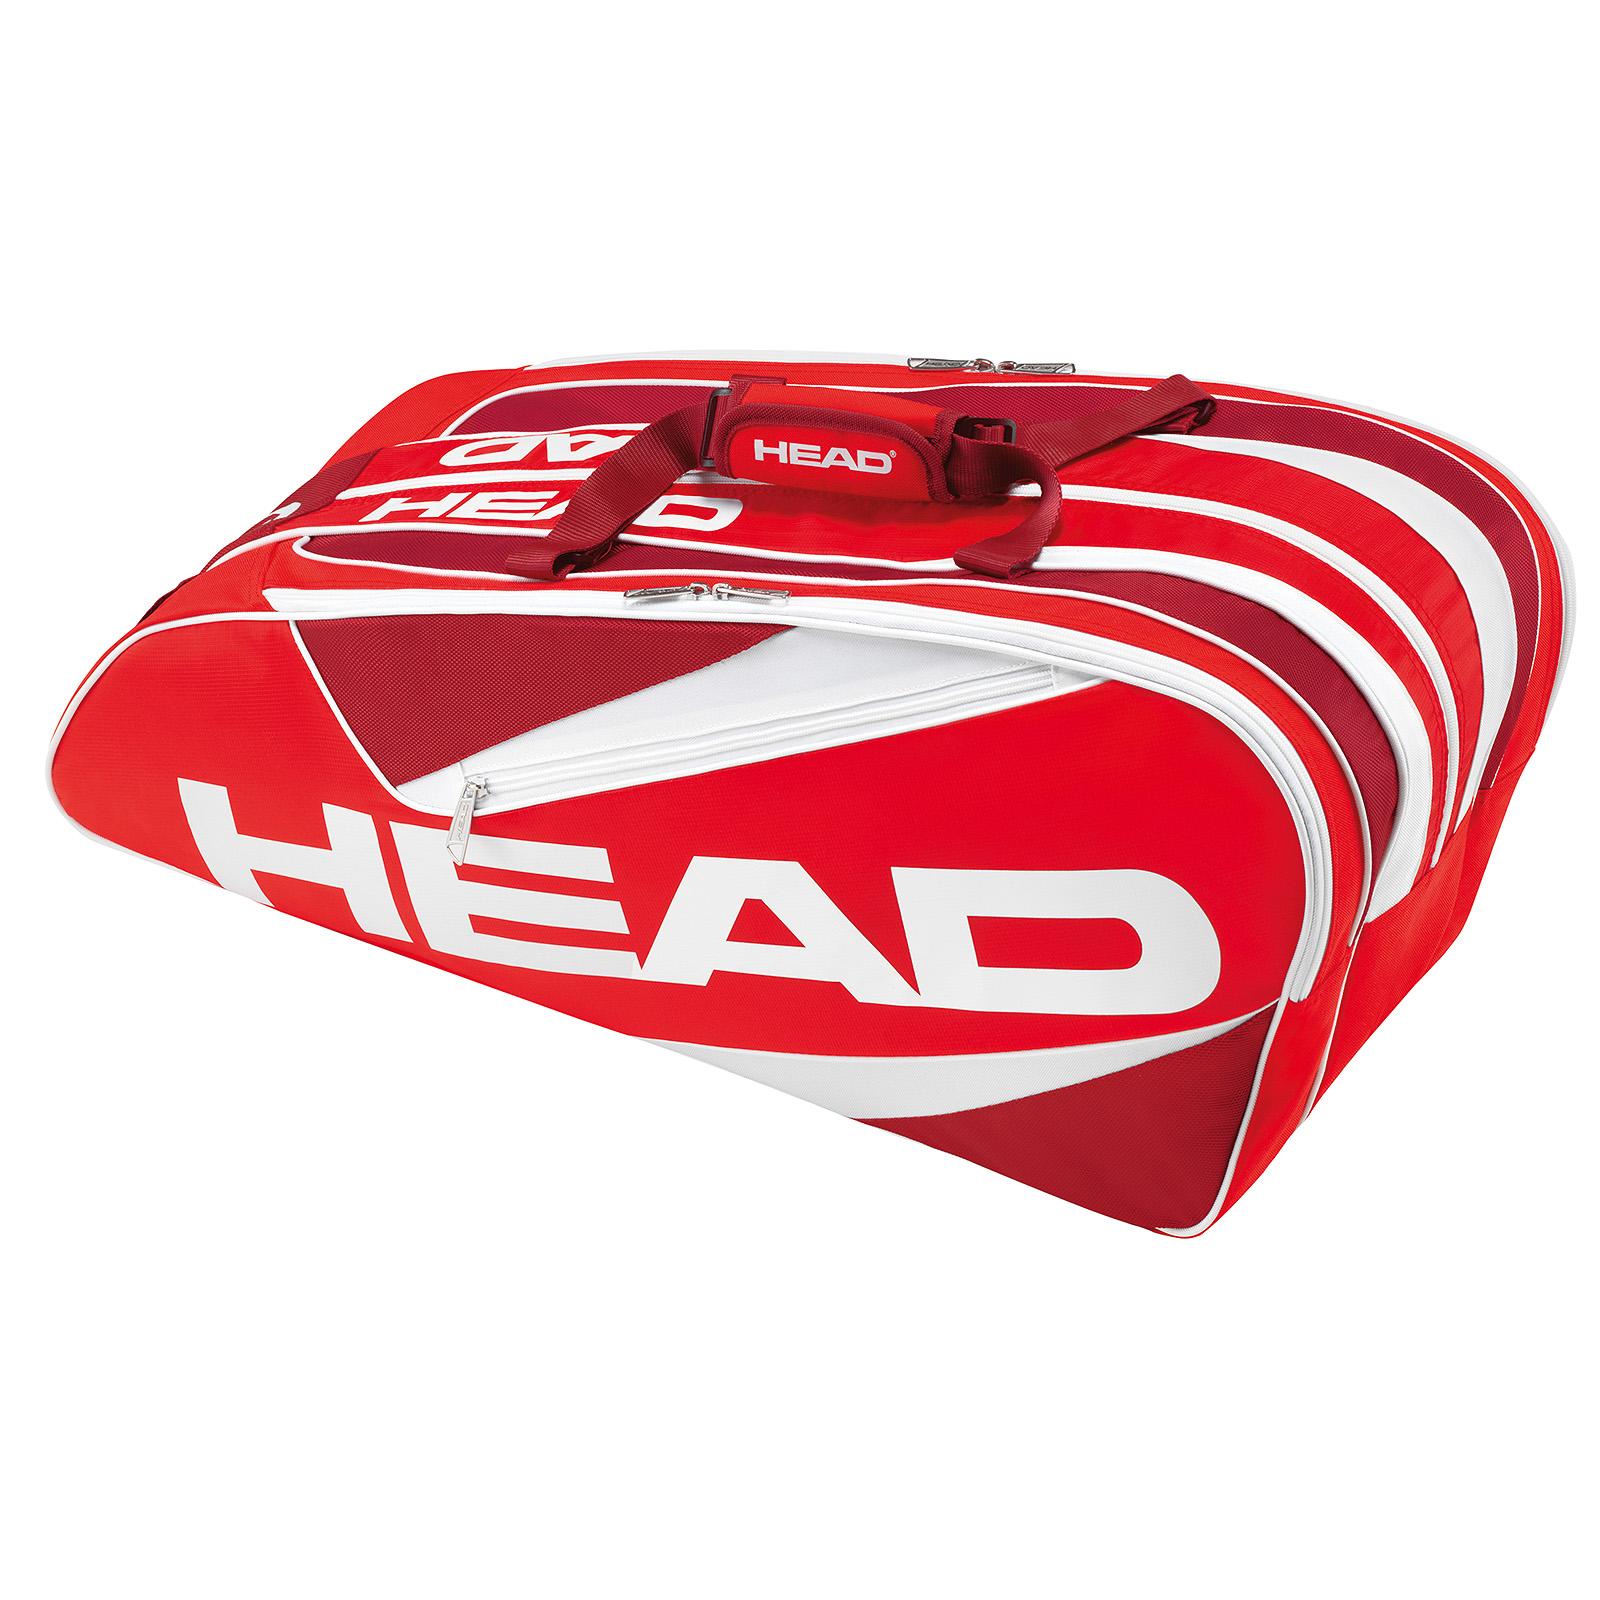 HEAD Elite Supercombi 9R Red